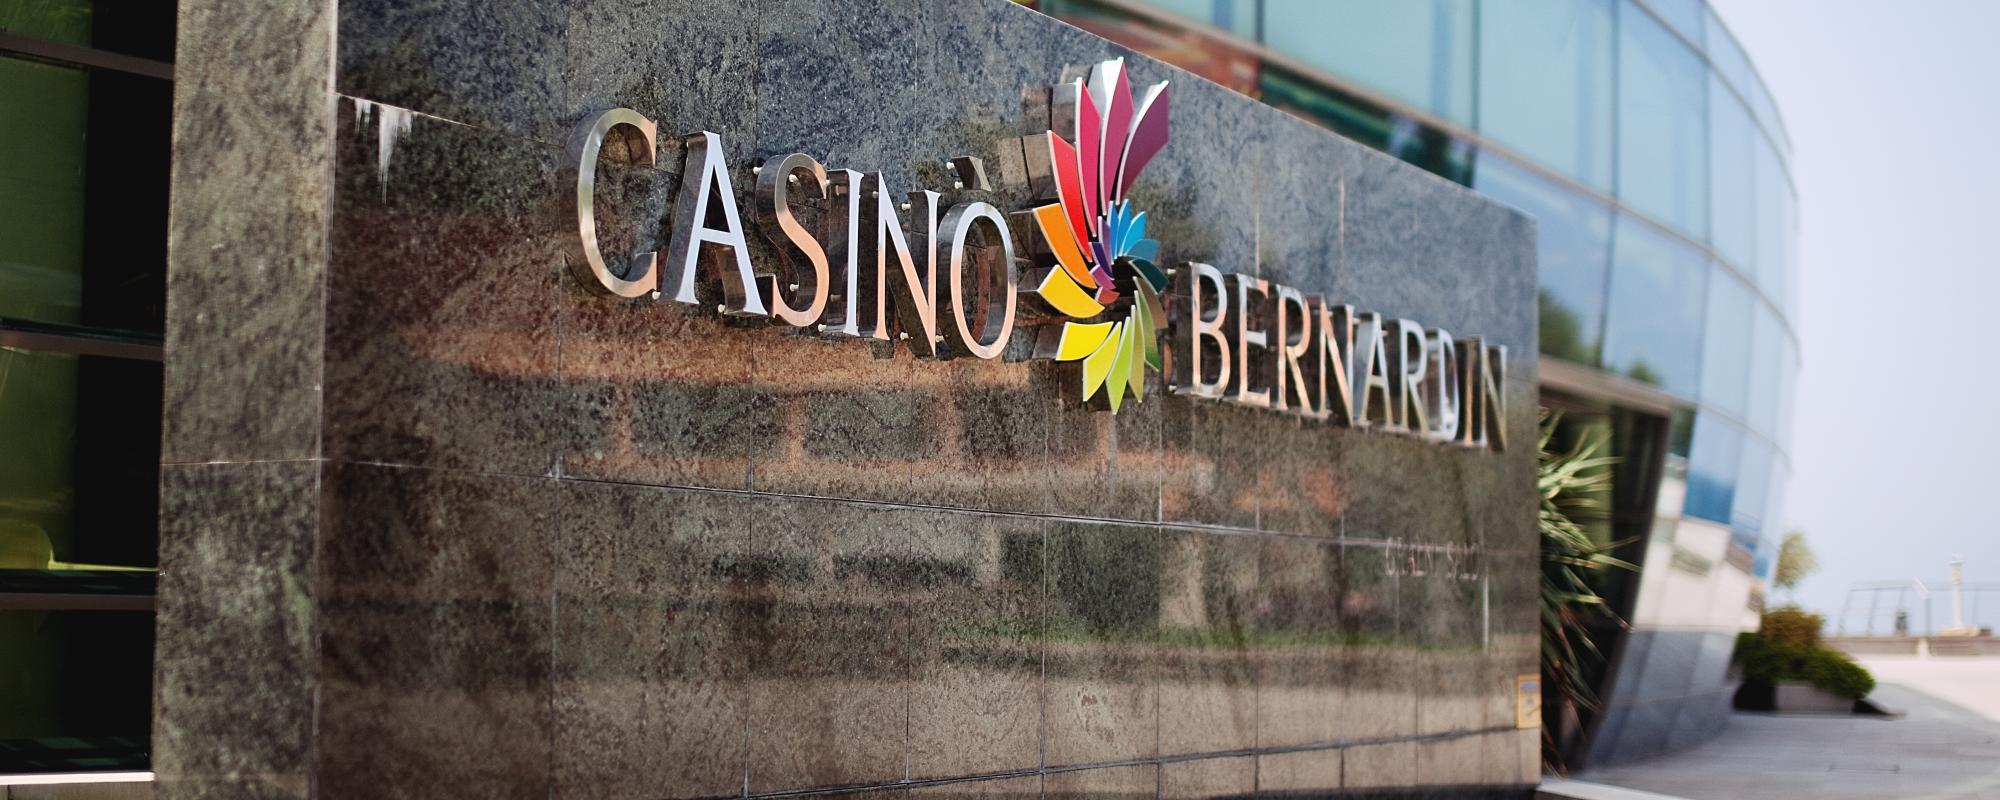 casino portoroz kleiderordnung